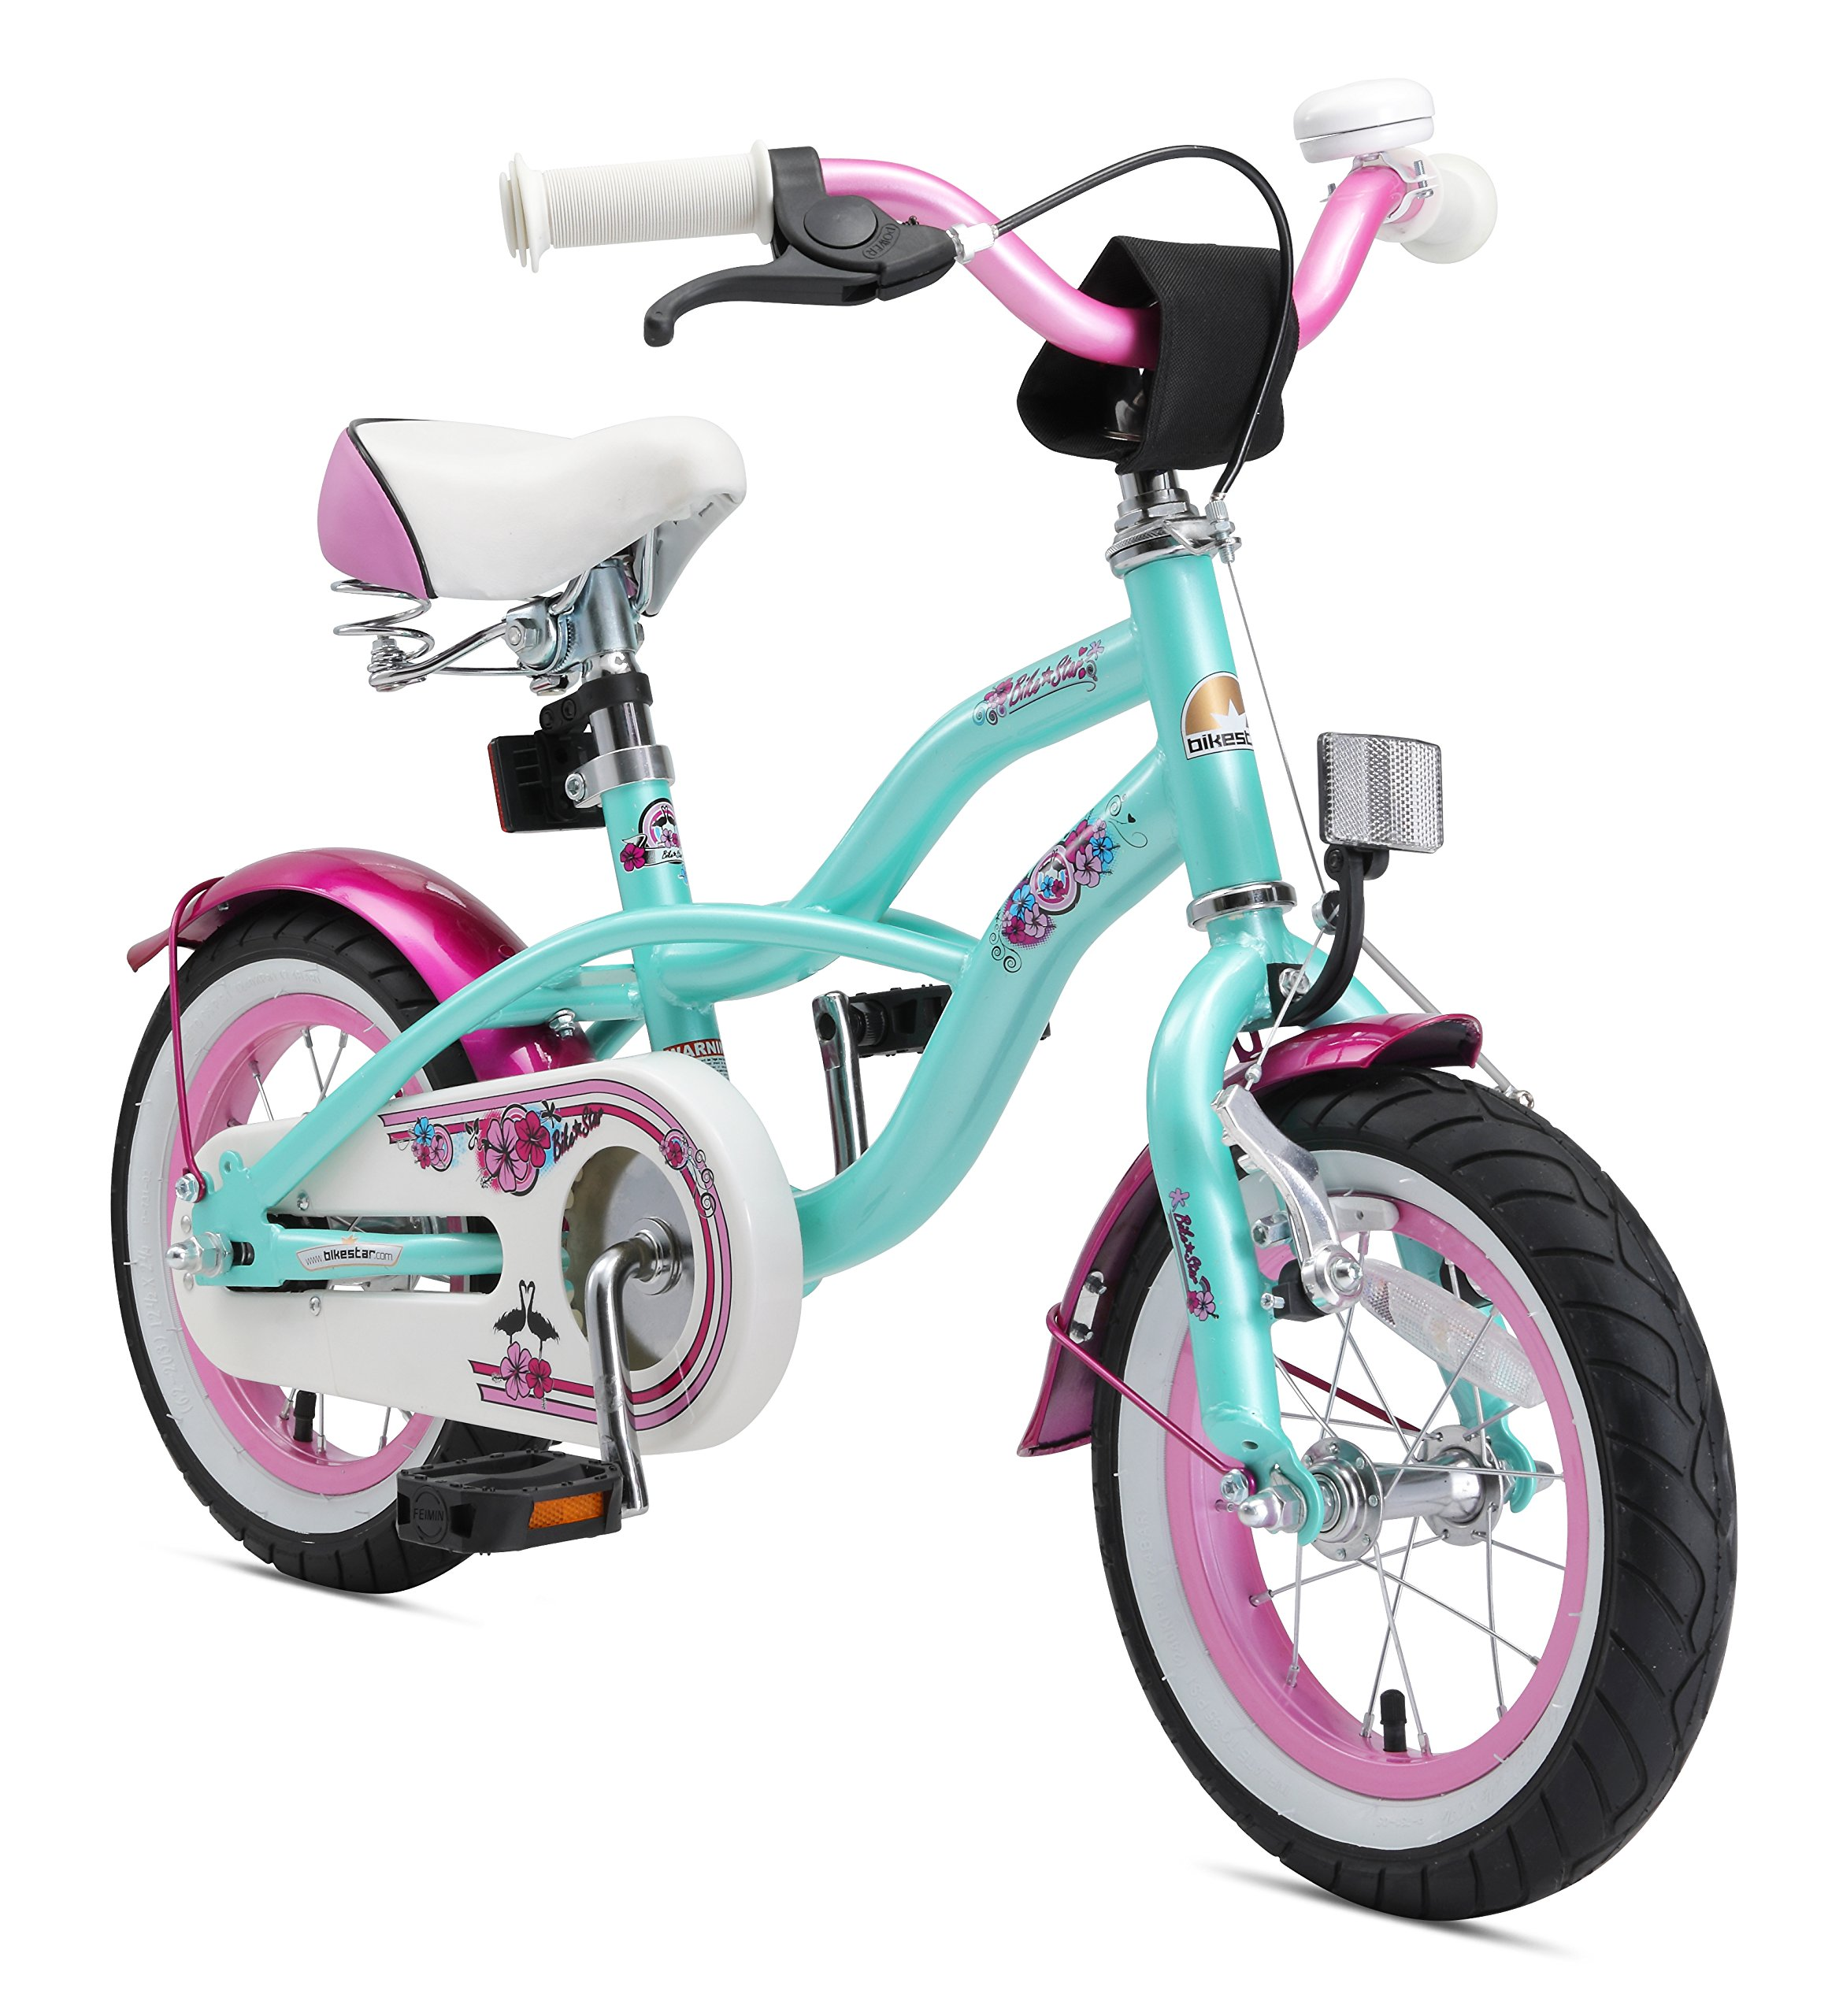 Bikestar Bicicleta para niños ☆ 12 Pulgadas ☆ Color Turquoise ☆ Frenos de Tiro Lateral y